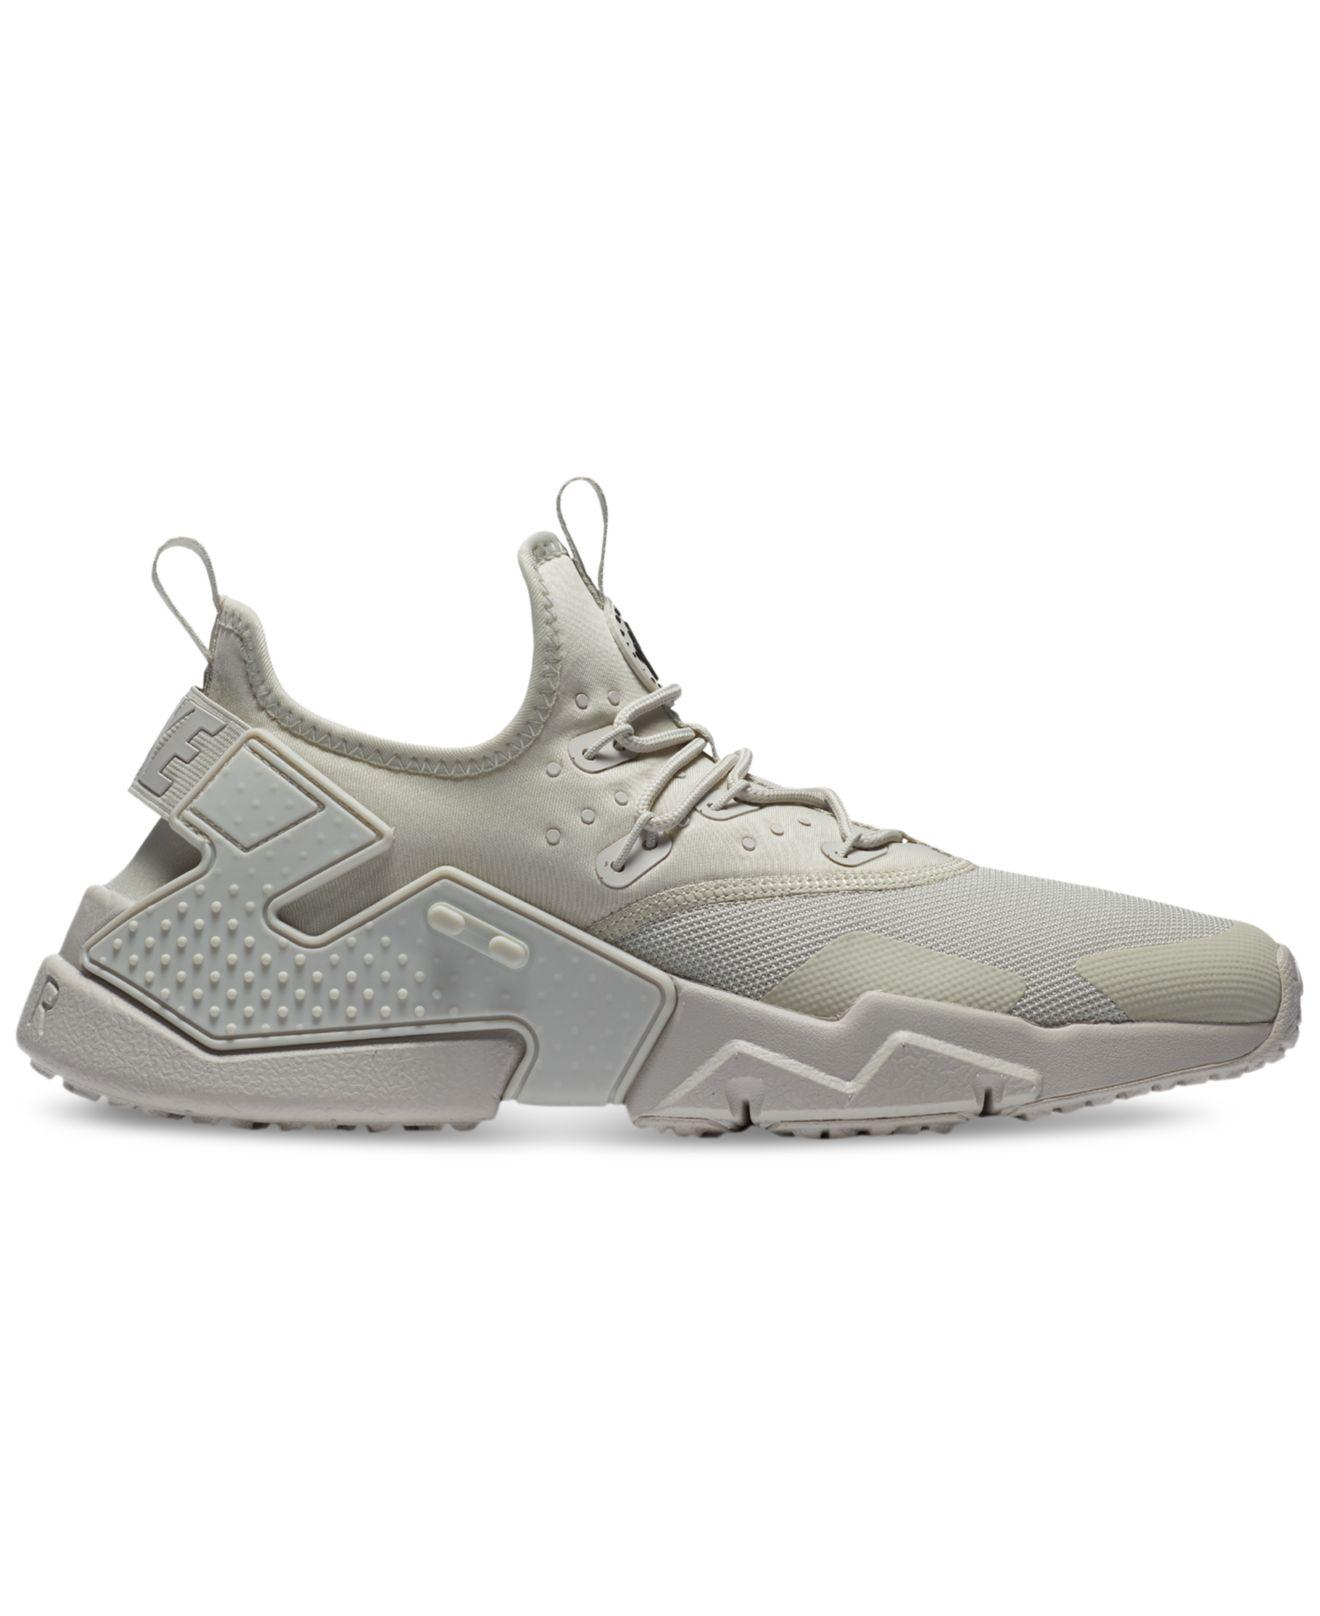 Lyst Nike Air Huarache Run Drift Casual Sneakers From Finish Line